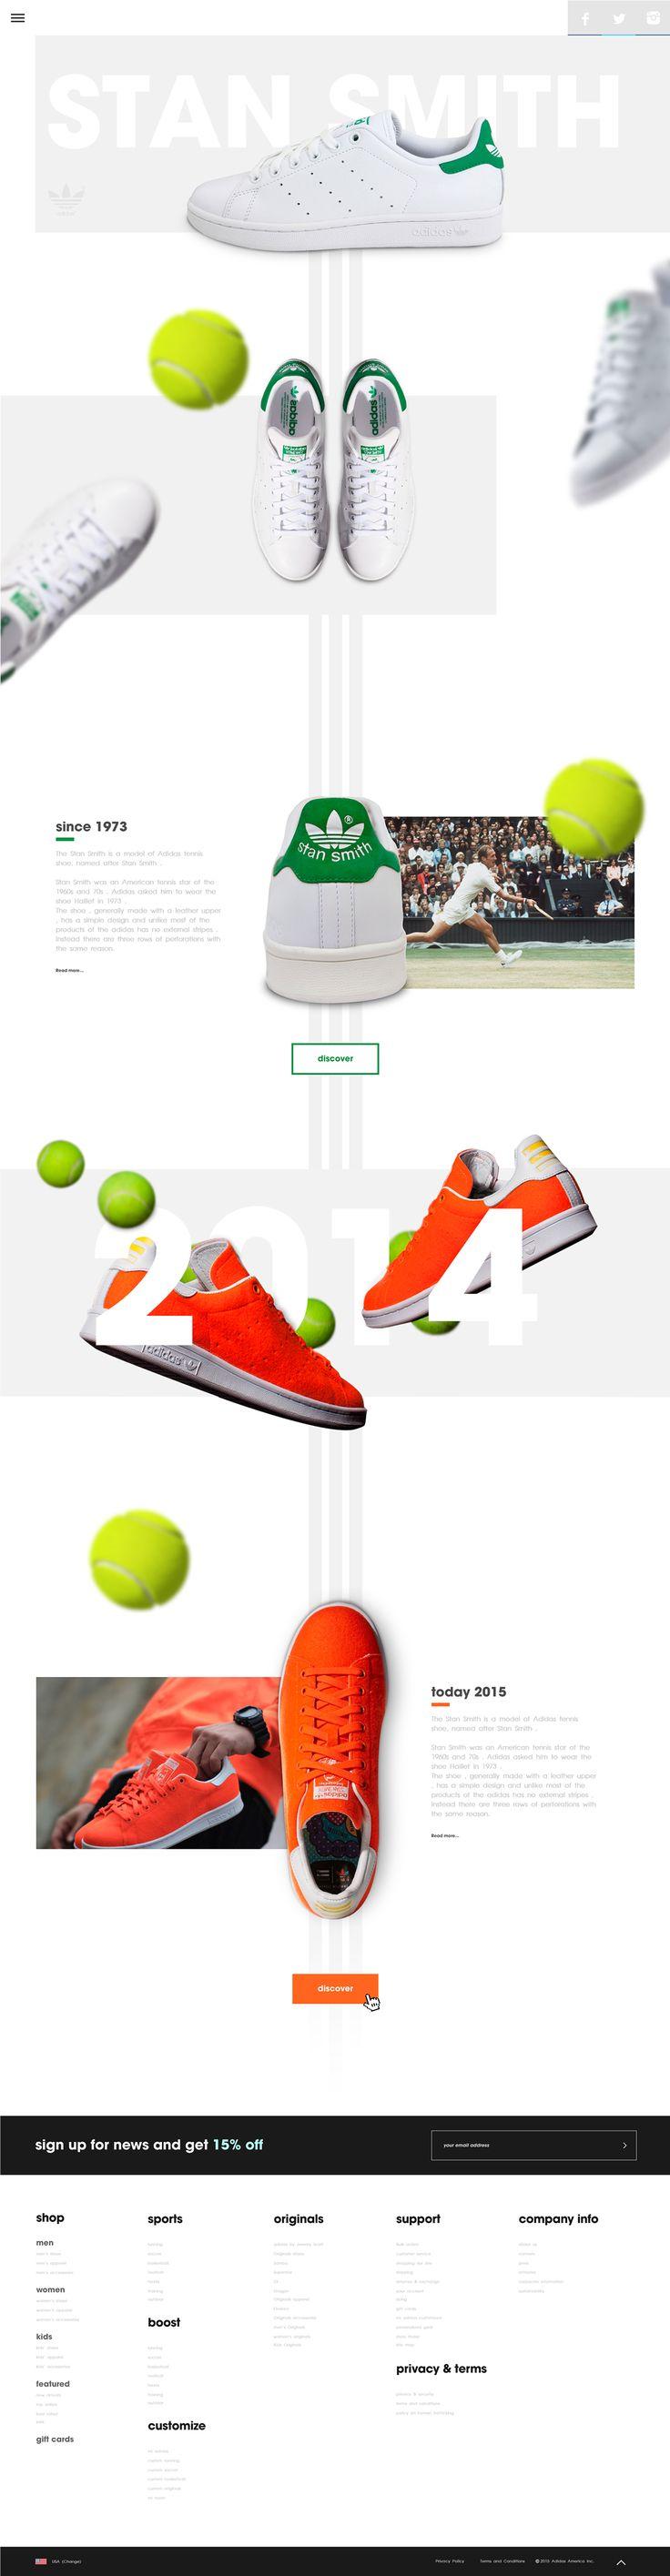 adidas Stan Smith on Web Design Served